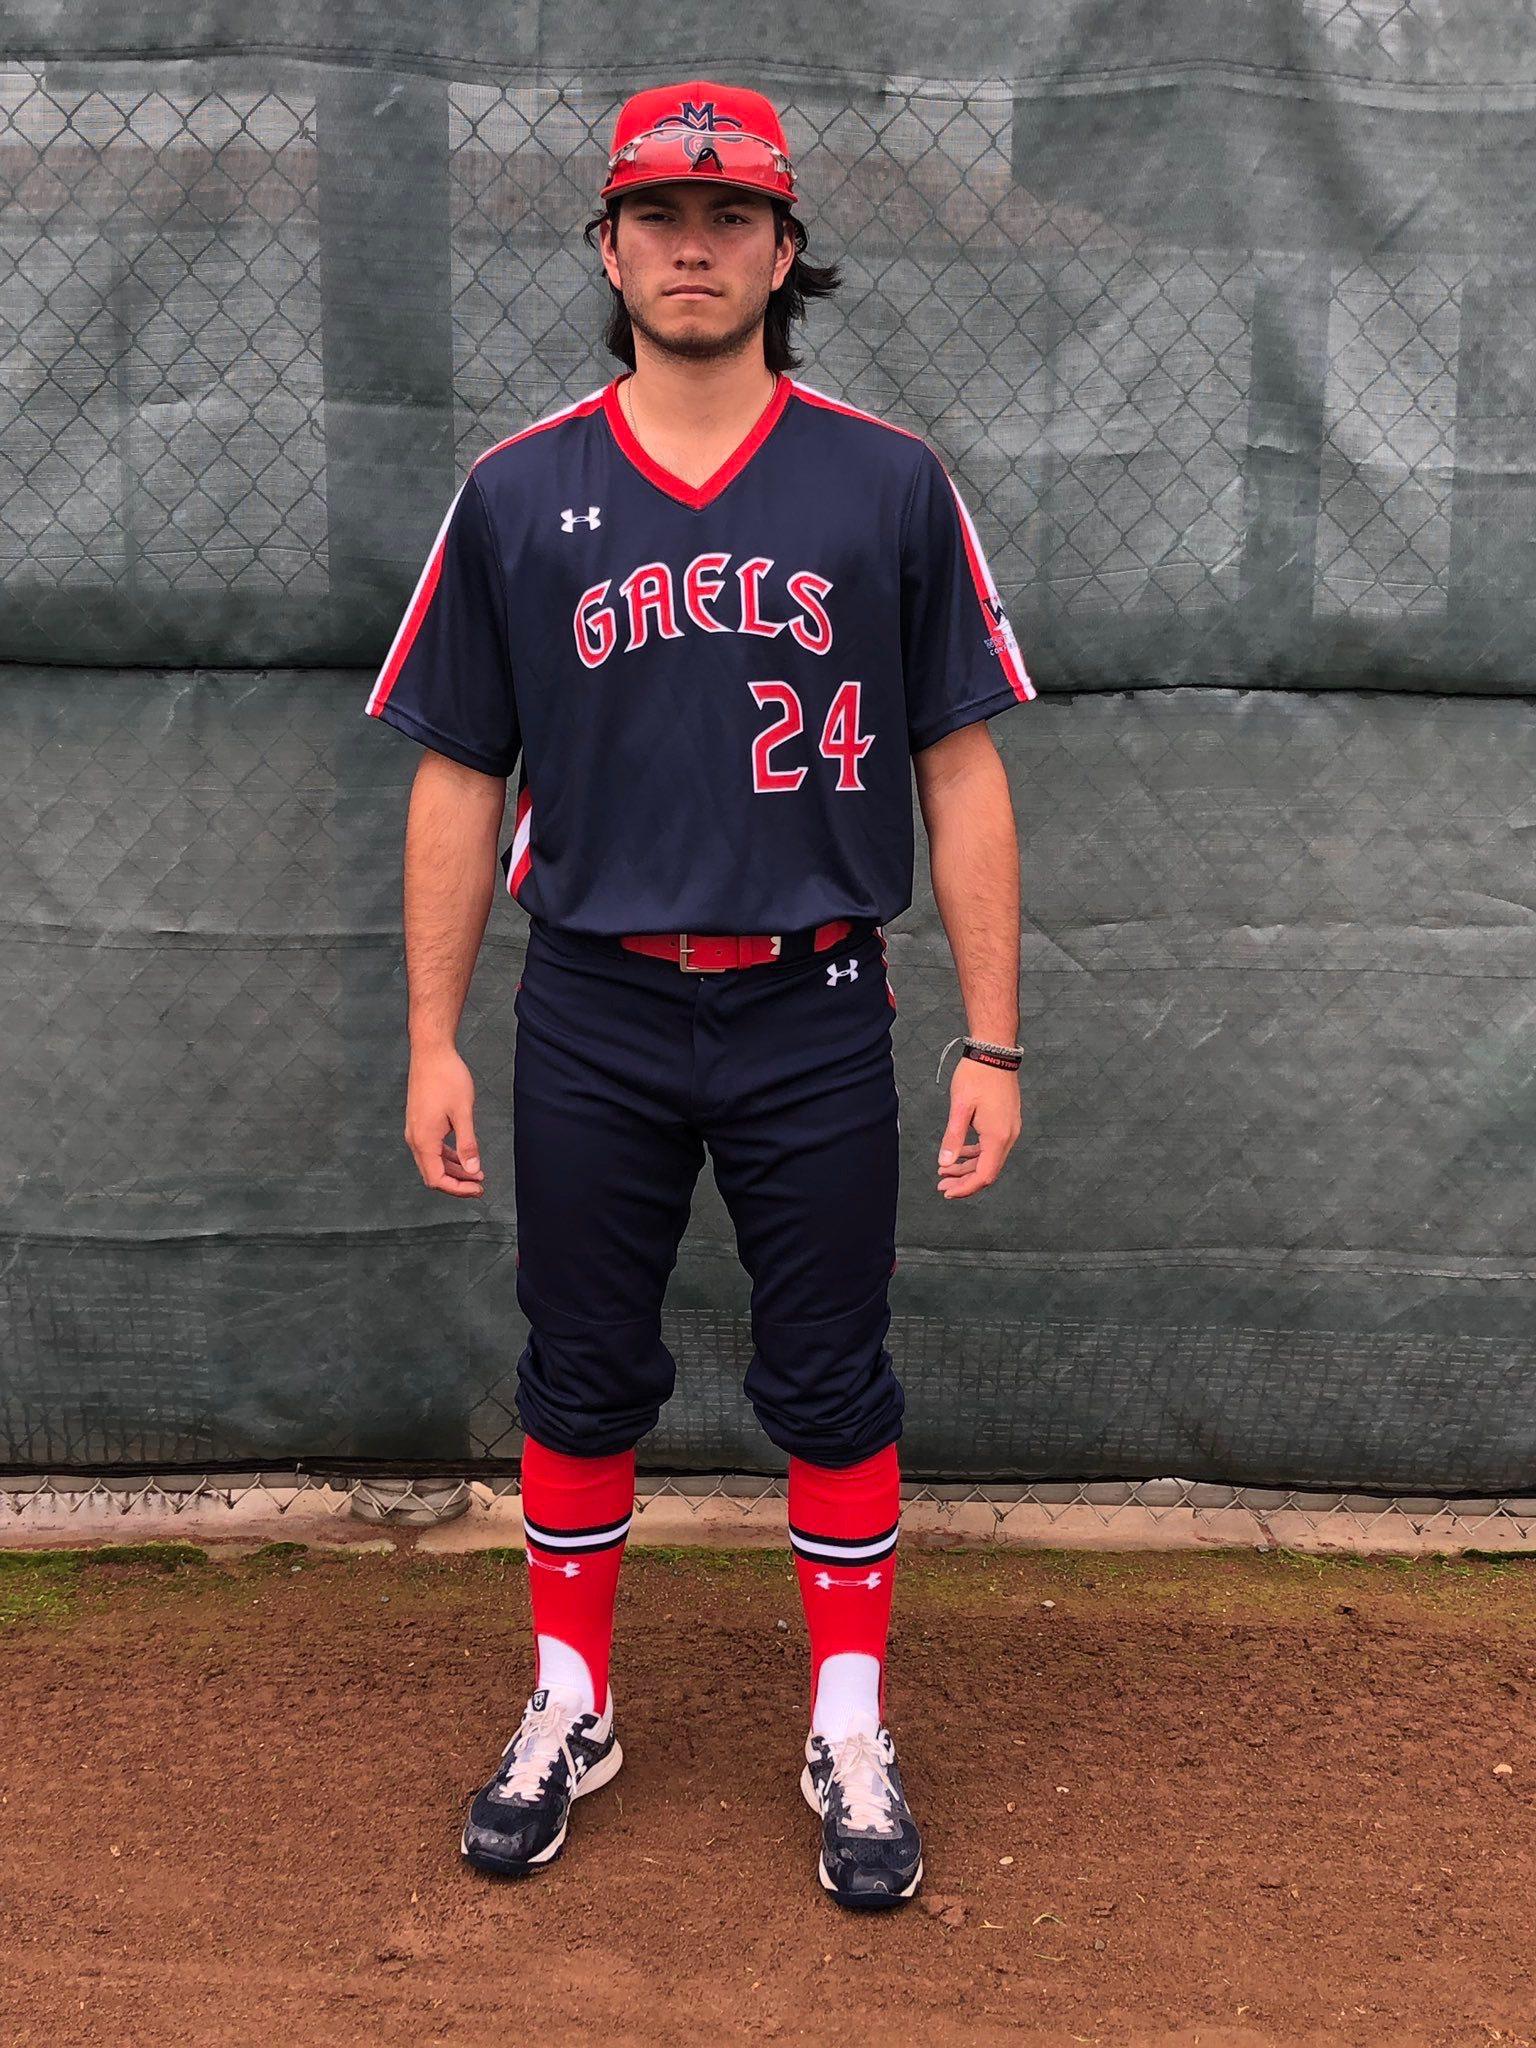 Uniformity: College Baseball's New Threads